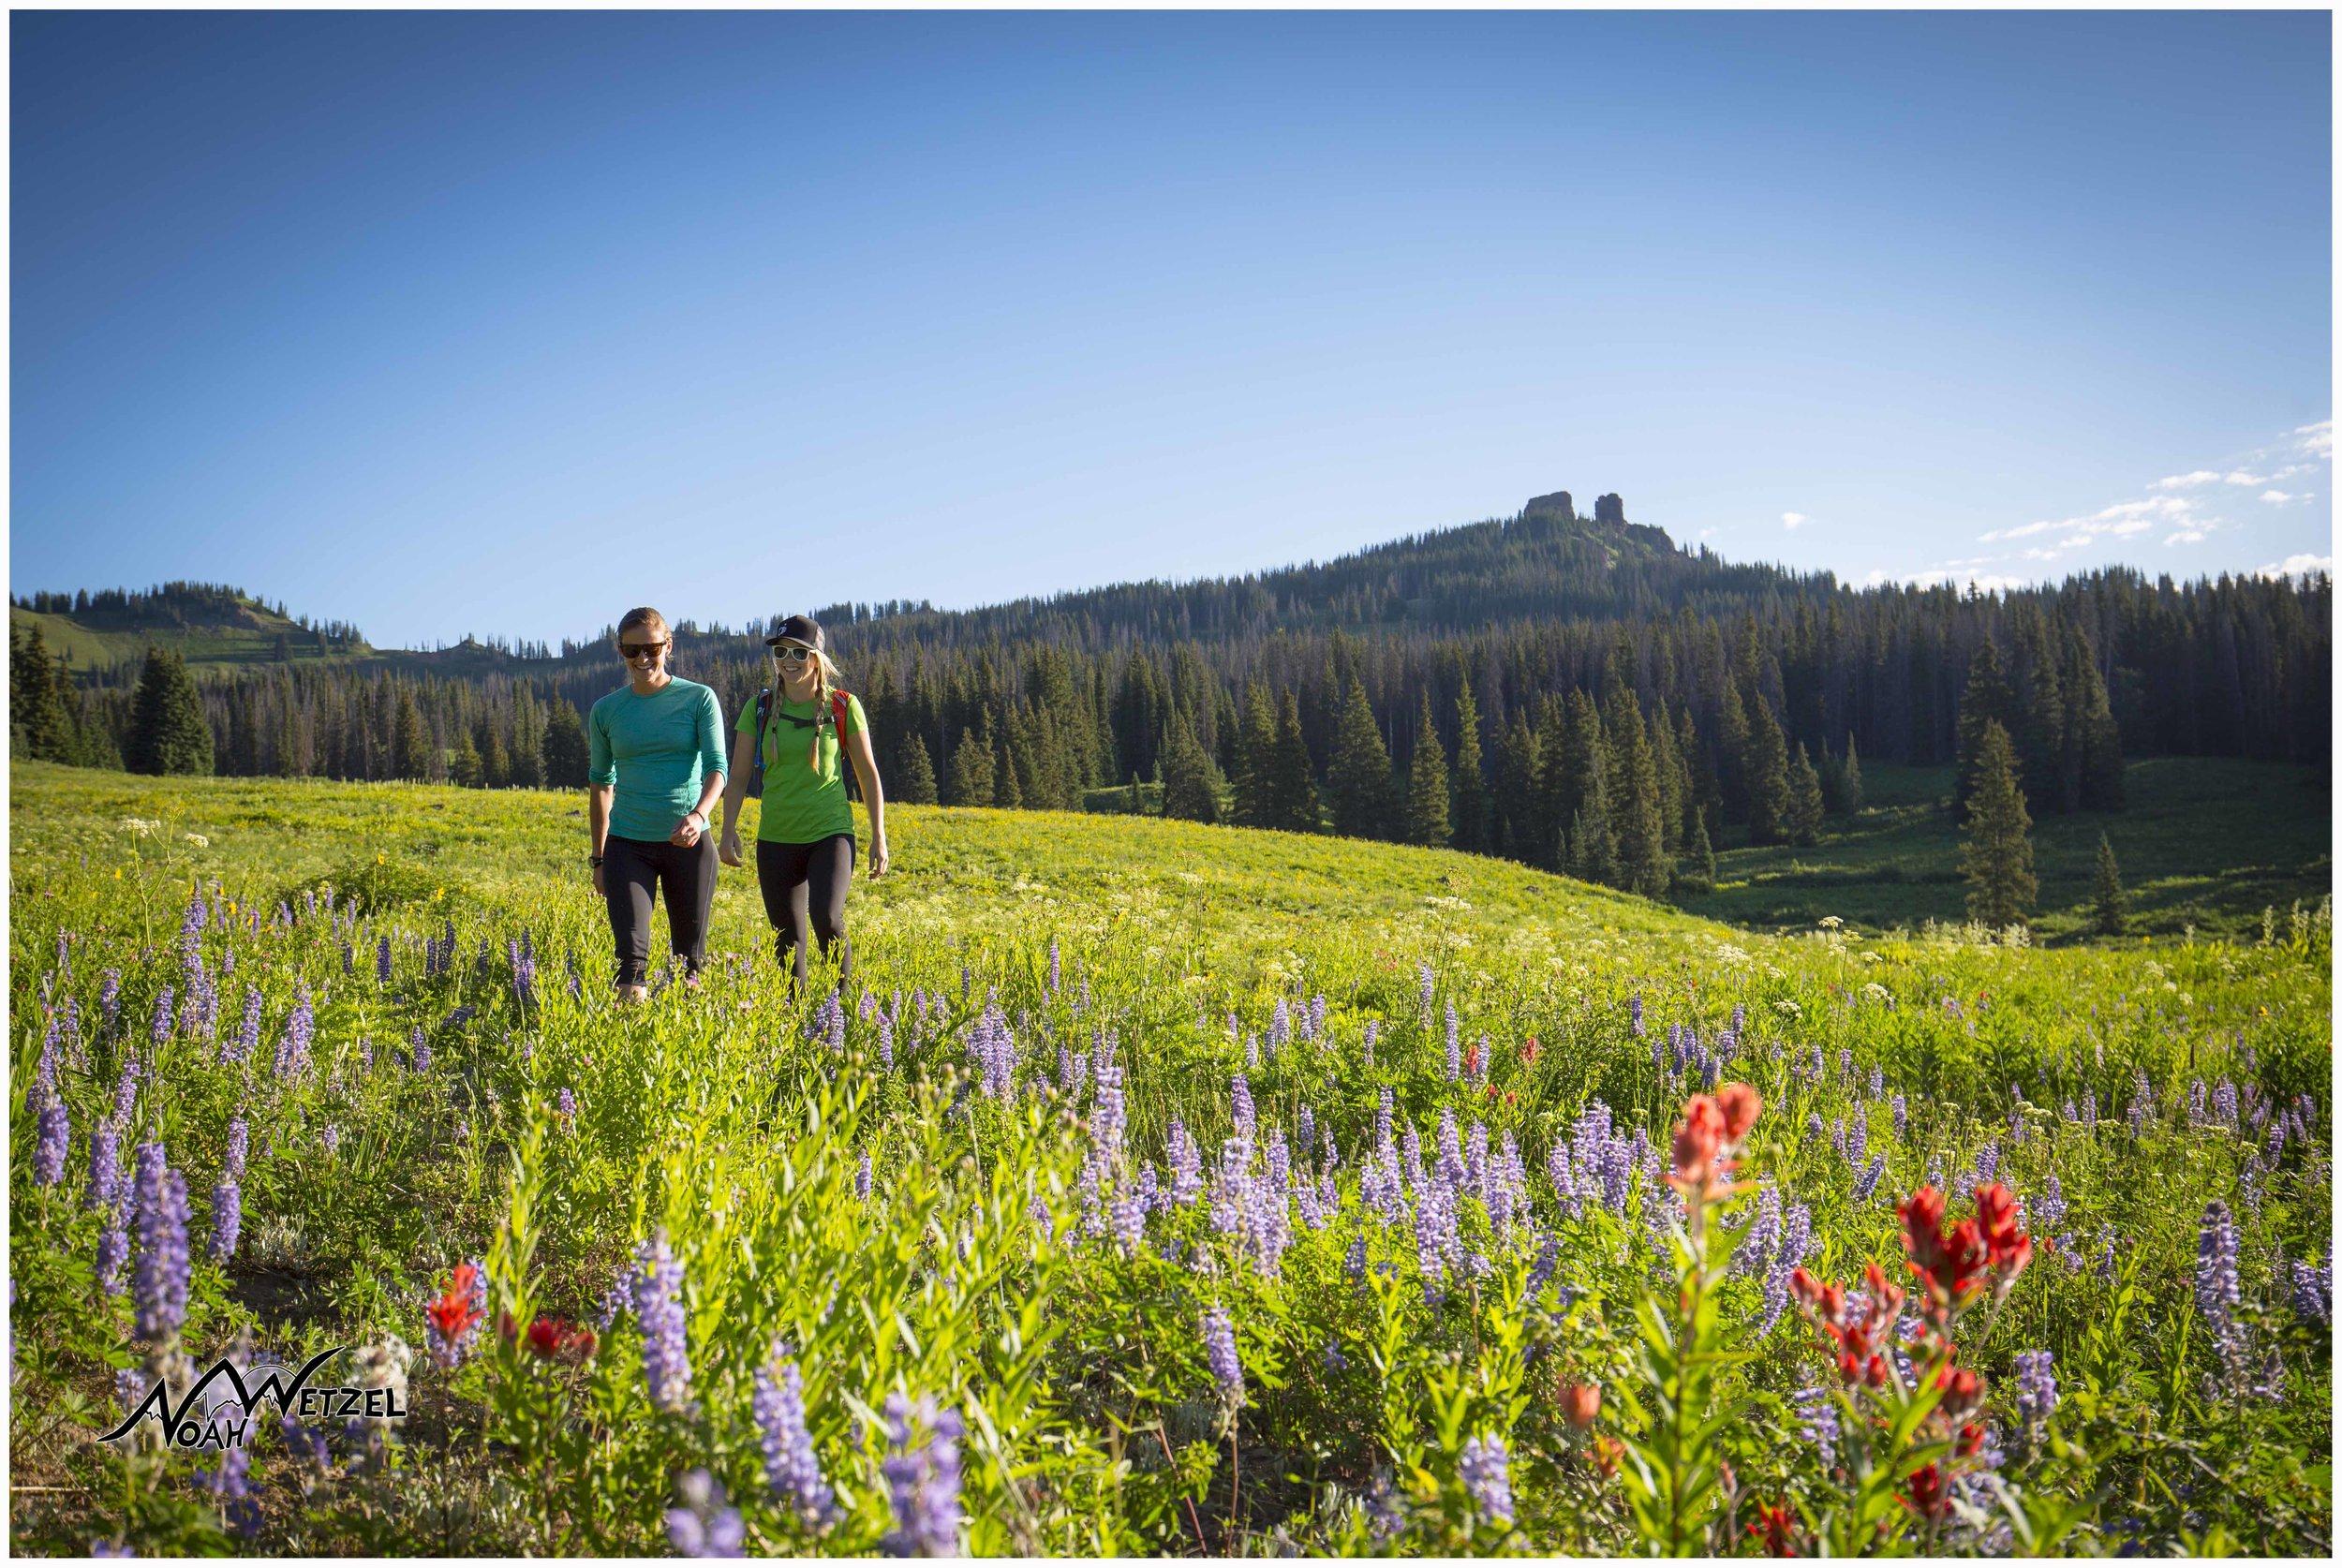 Jordan Edwards and Miranda Schrock hike Rabbit Ears Peak. Colorado